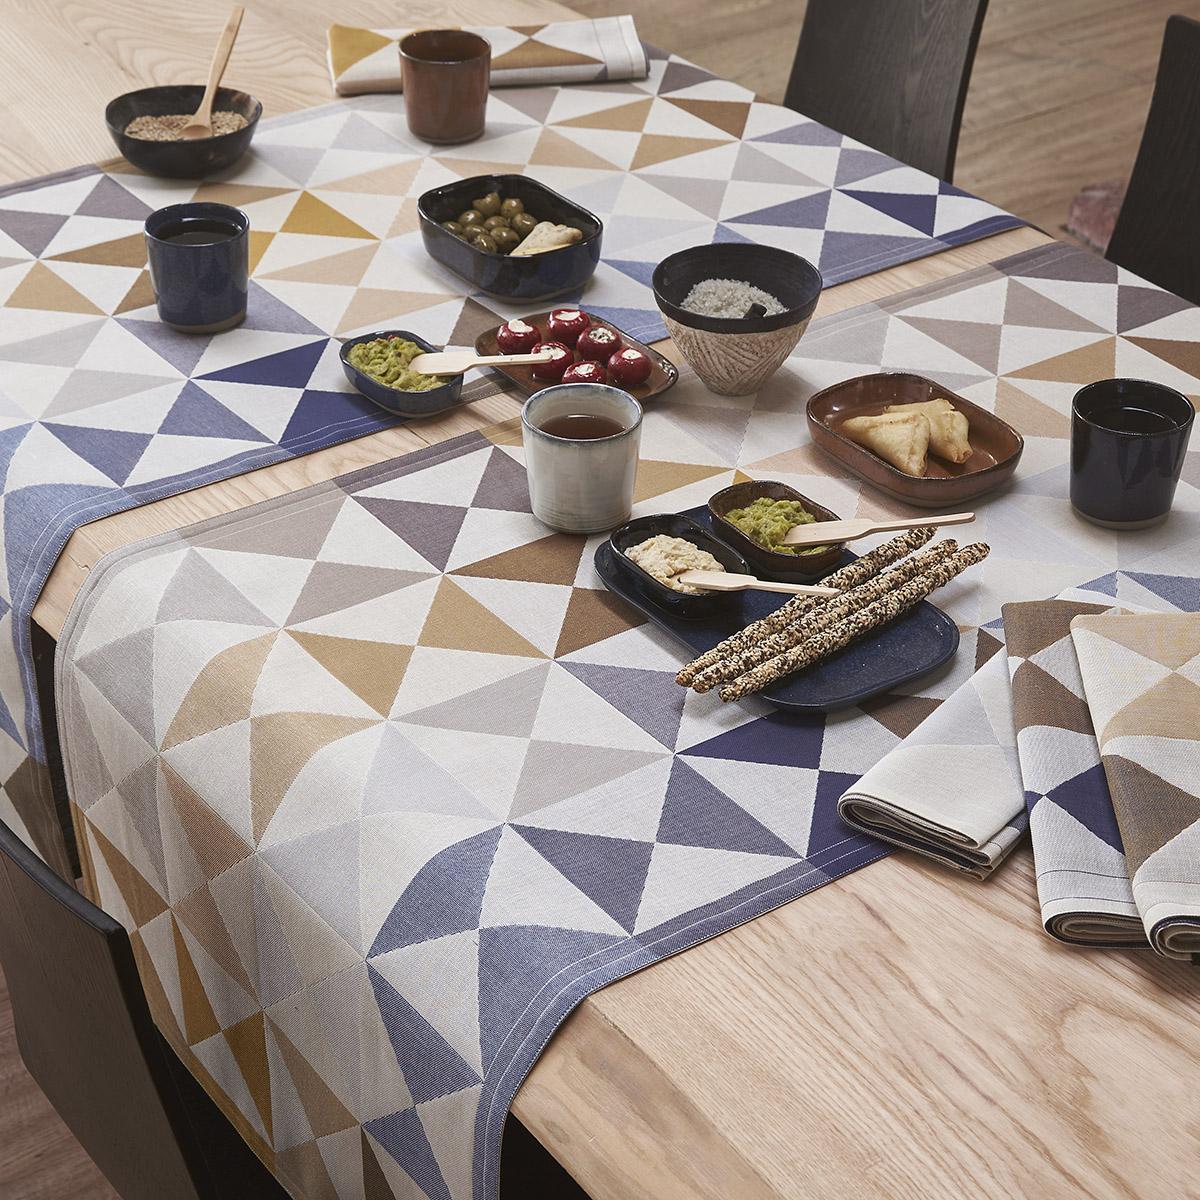 Chemin de table en coton polychrome 50 x 150